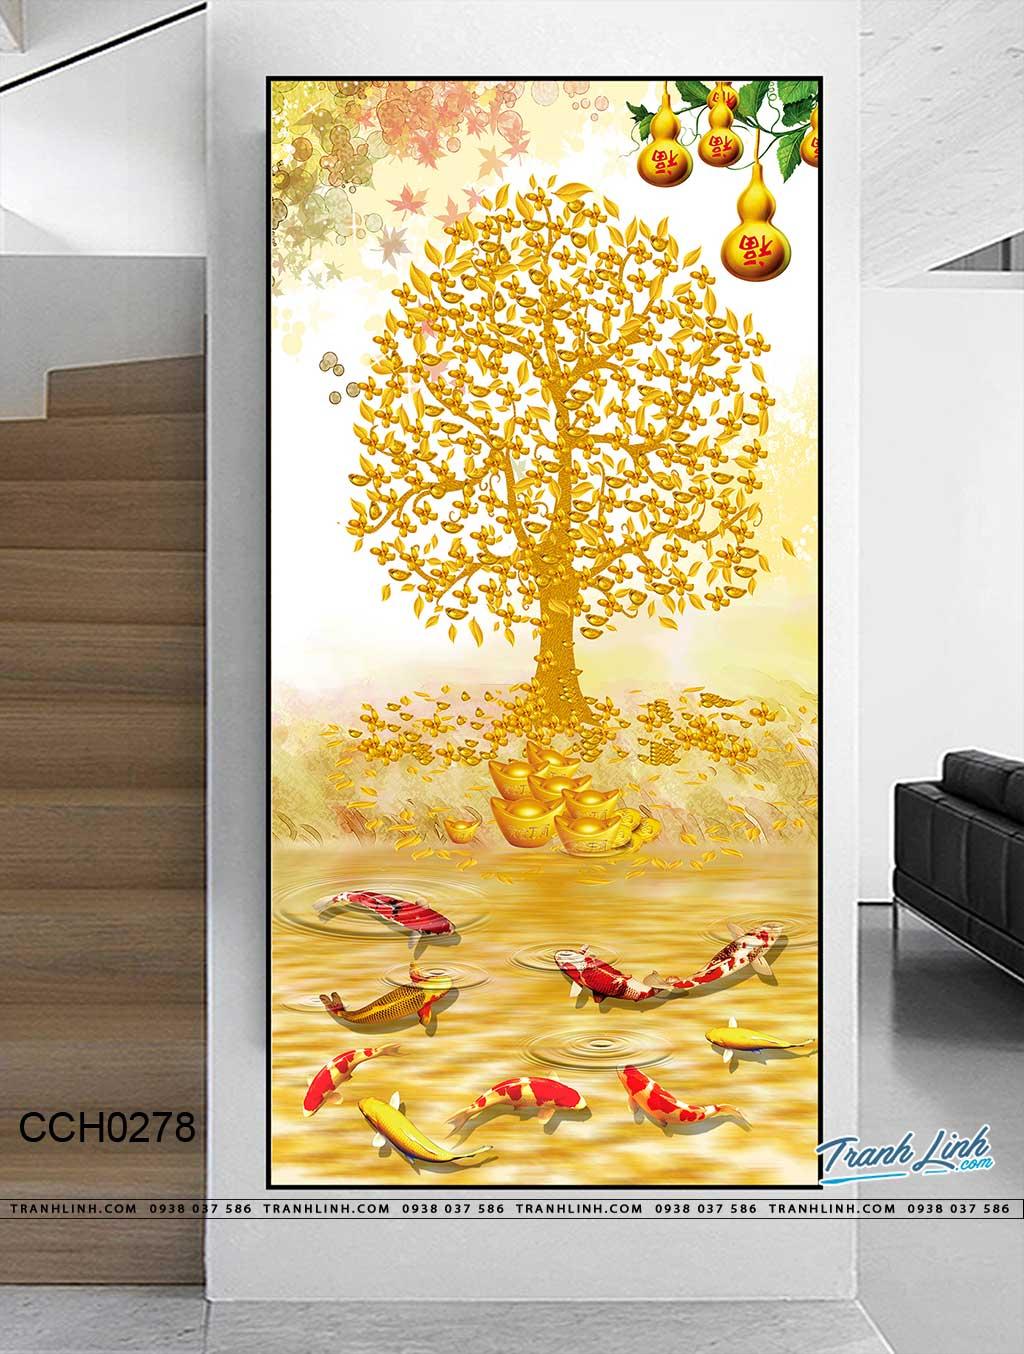 tranh_in_canvas_ca_chep_cch0278.jpg